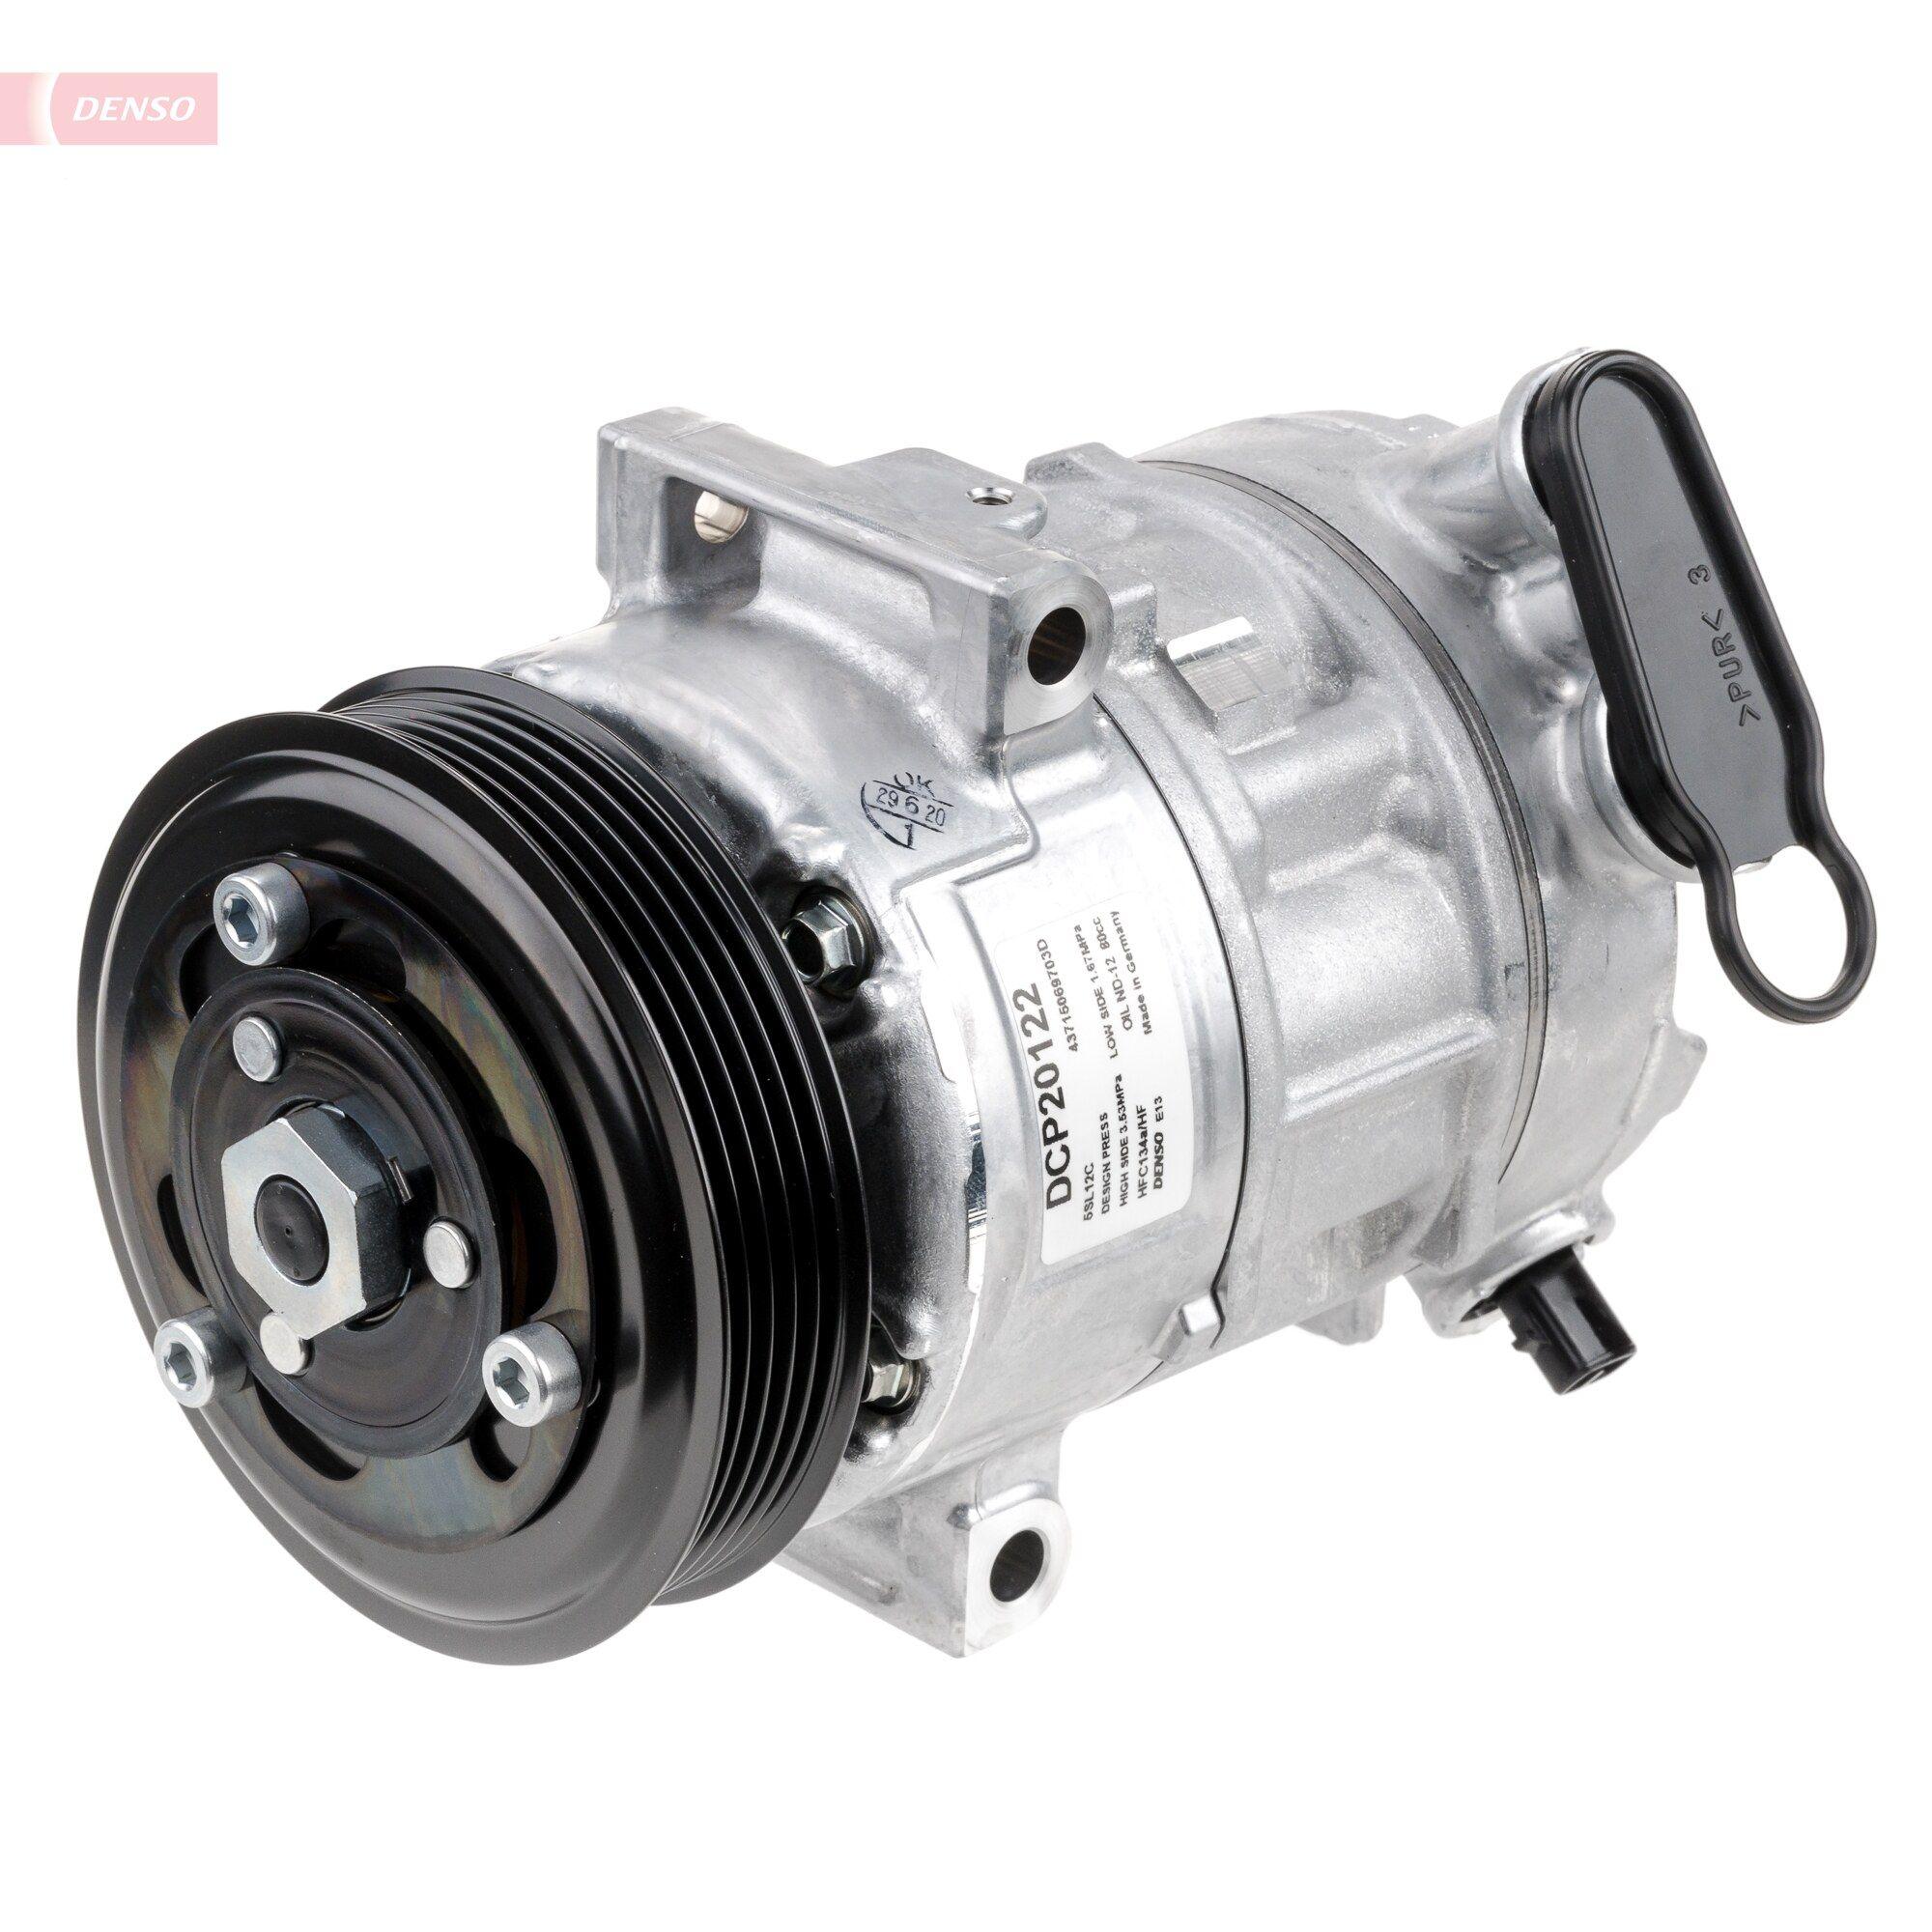 Klimakompressor Opel Corsa D 2009 - DENSO DCP20122 (Riemenscheiben-Ø: 110mm, Anzahl der Rillen: 5)